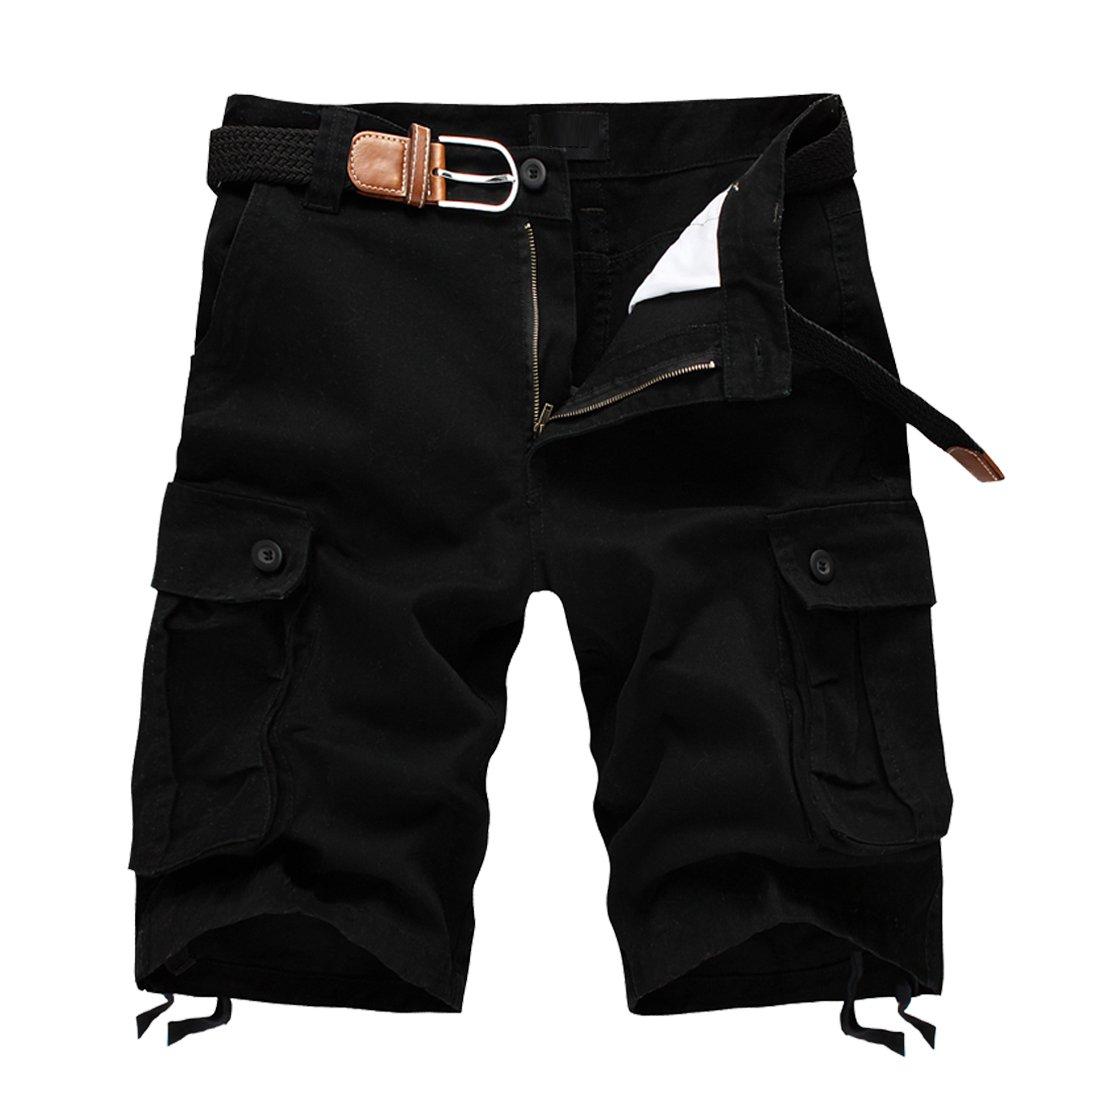 DR. MAのGOTEK Cotton Casual Mens Cargo Shorts Pants Summer Fashion Sports Beach Travel Pockets Camouflage Shorts (Black, 42)